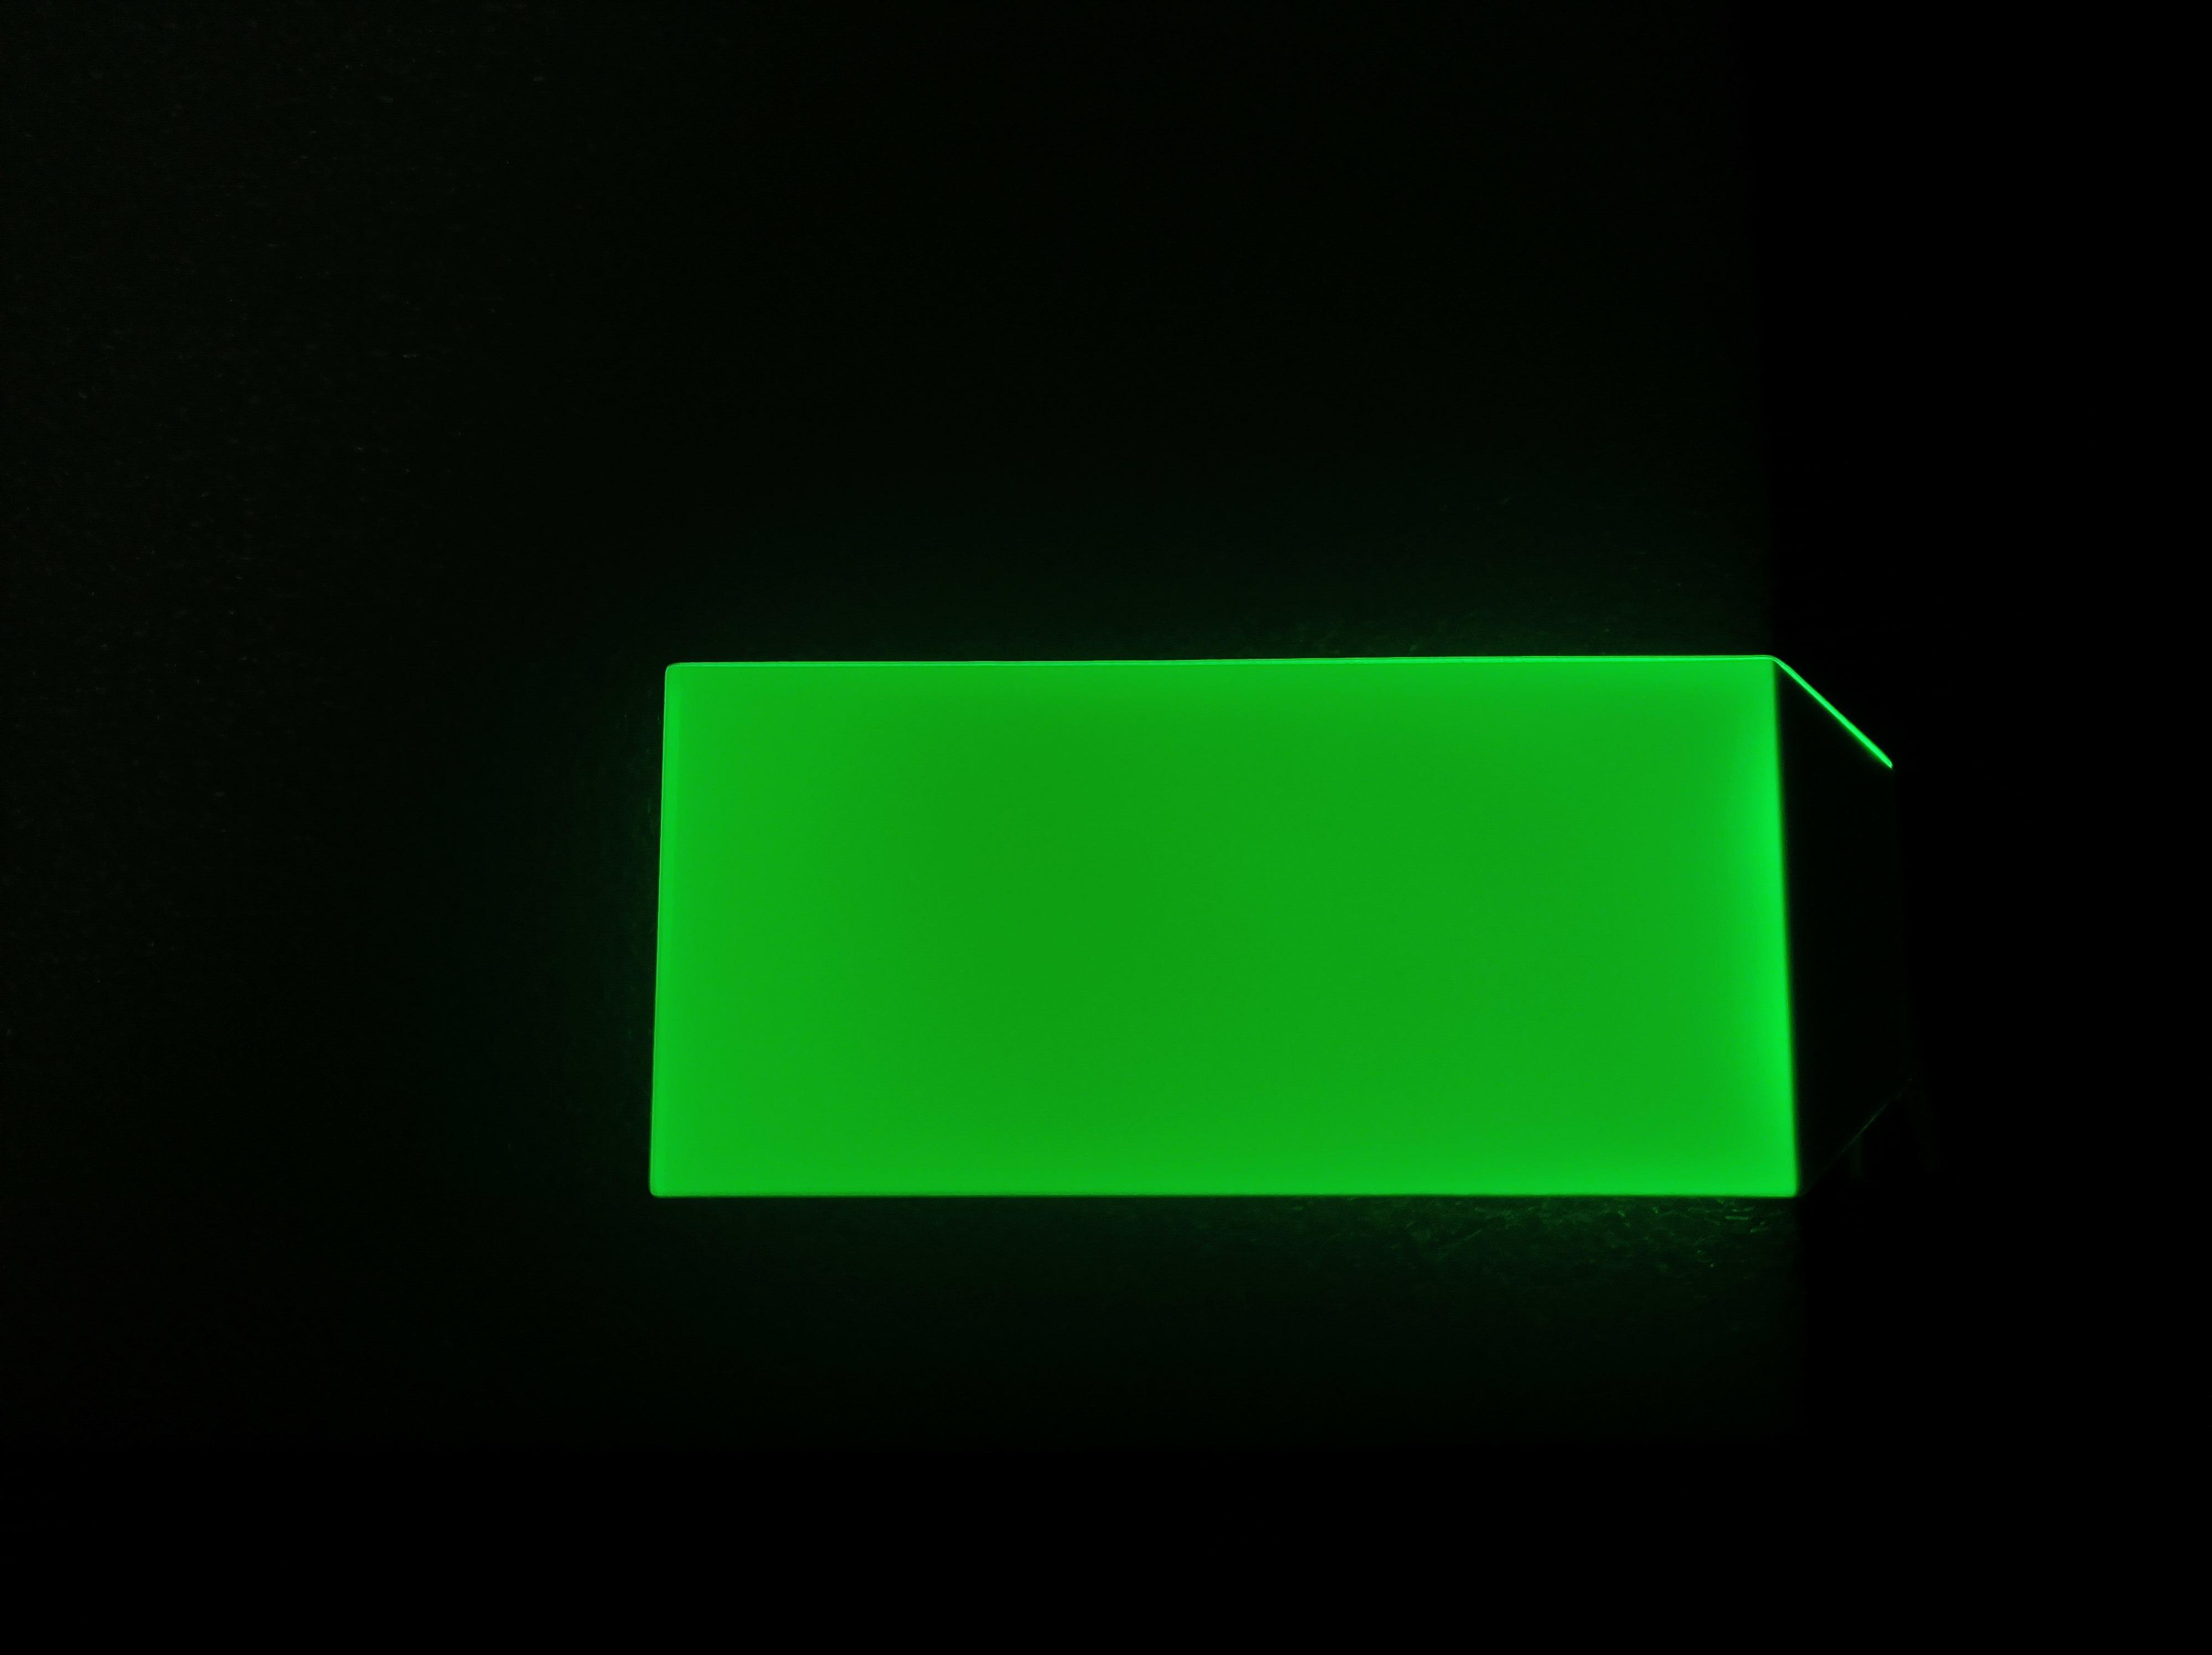 RGB LCD backlight